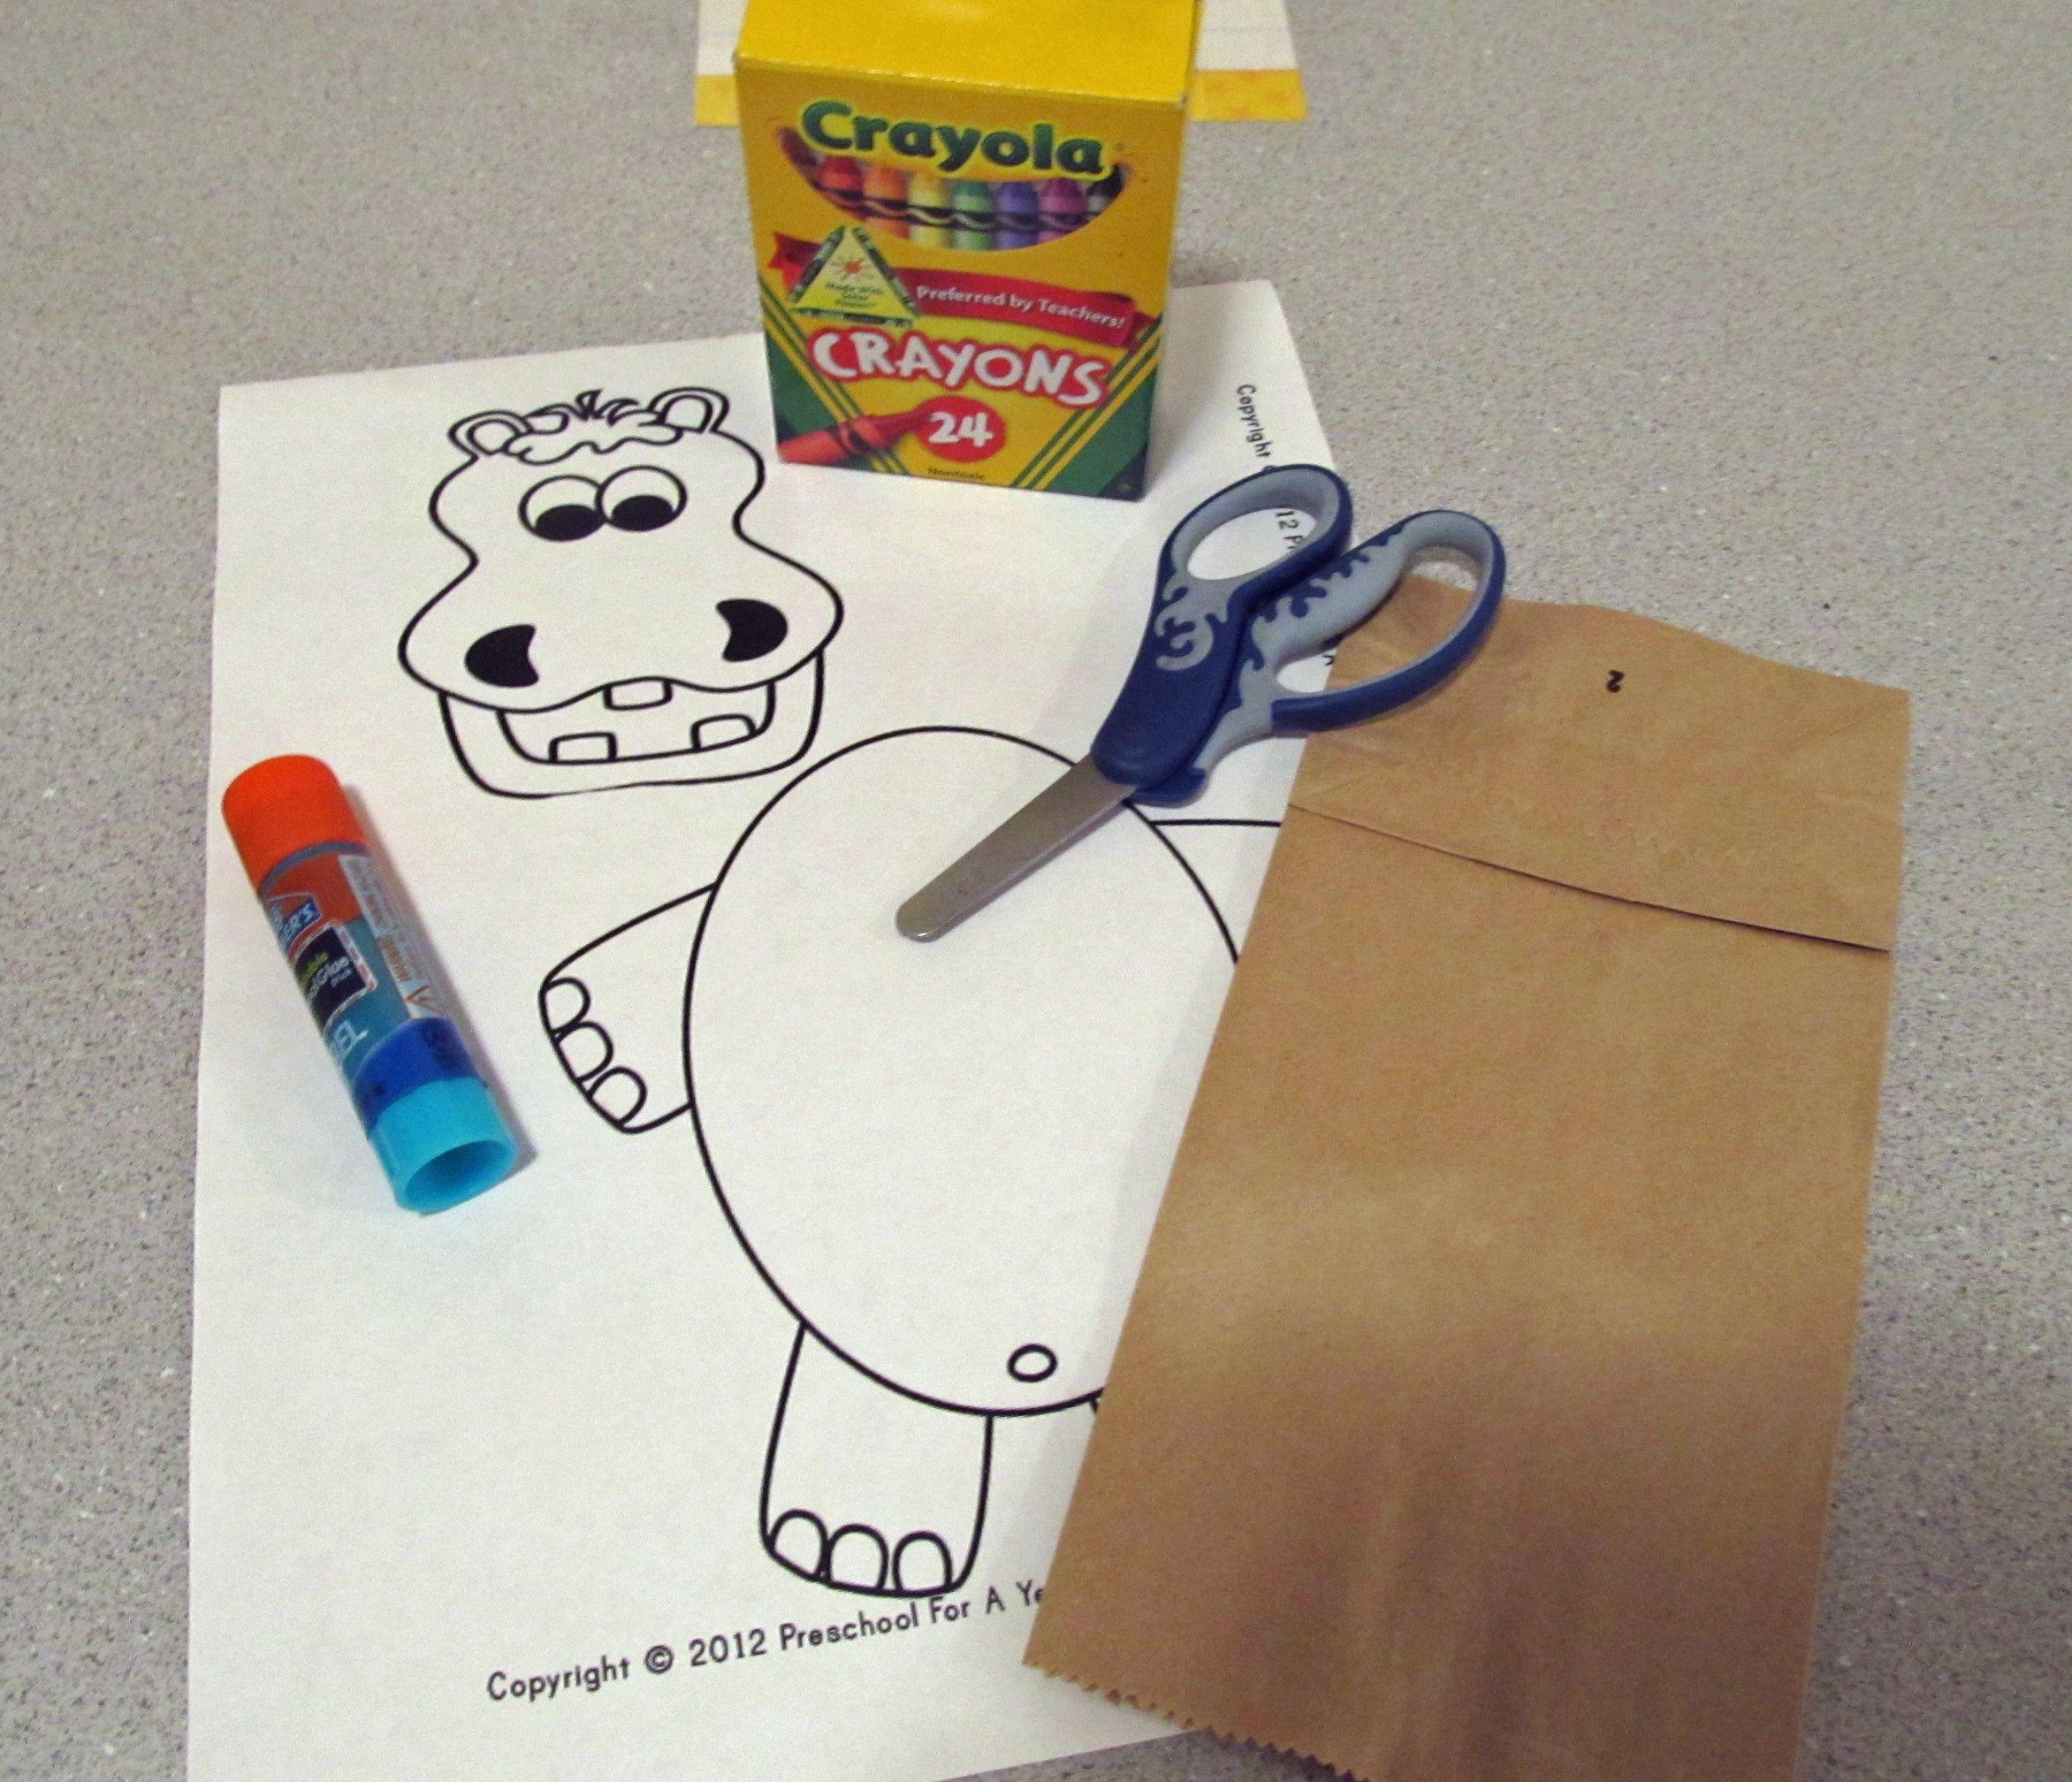 Online Preschool Program Supplies Needed For Letter H